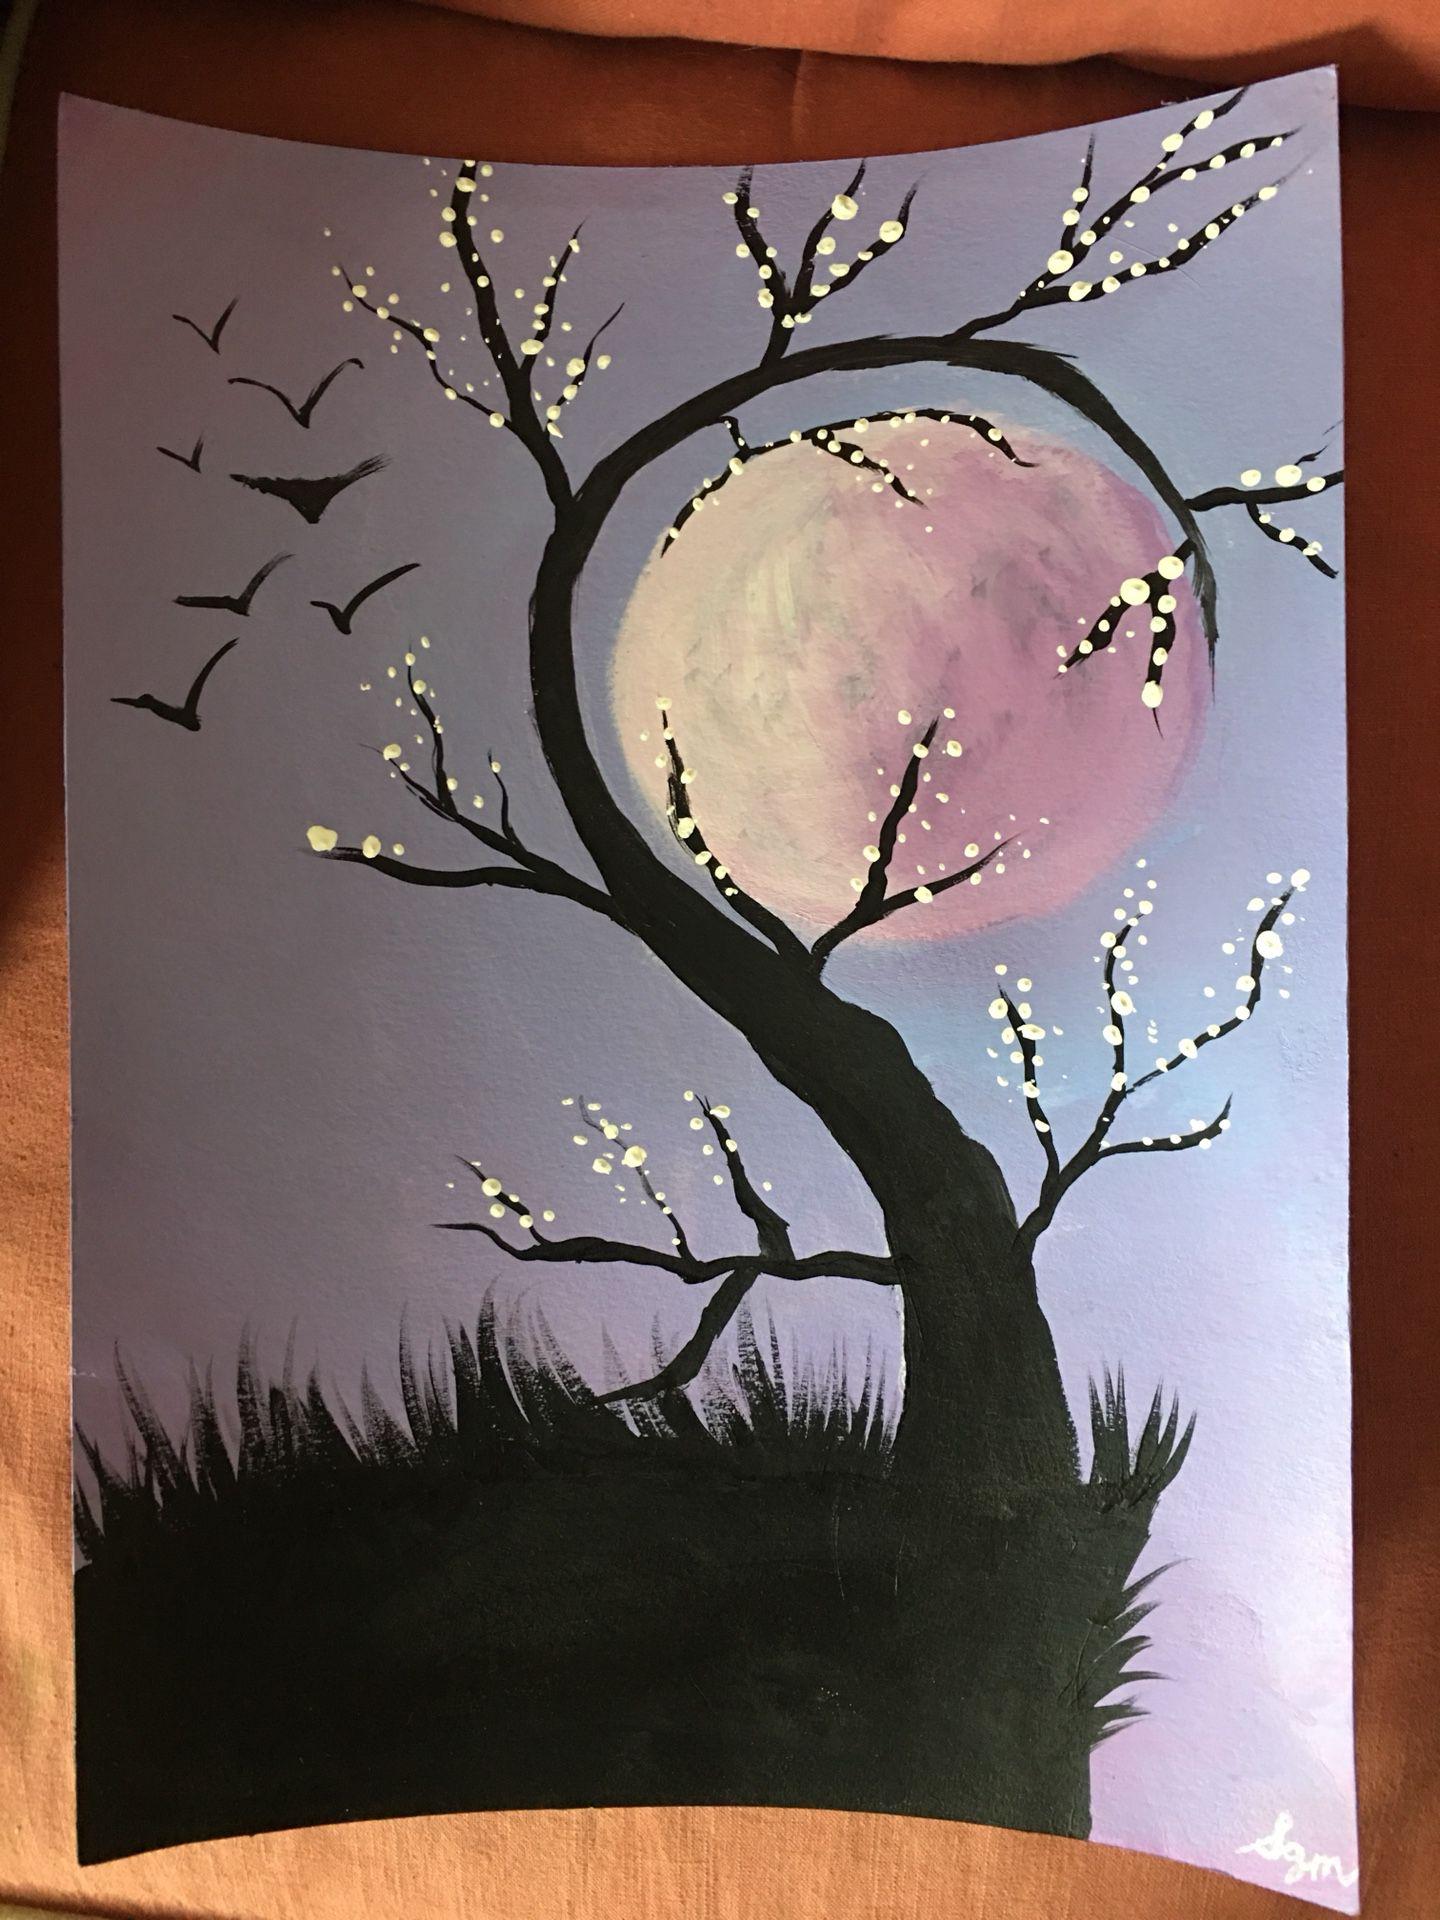 Original spooky tree moonlit silouhette painting